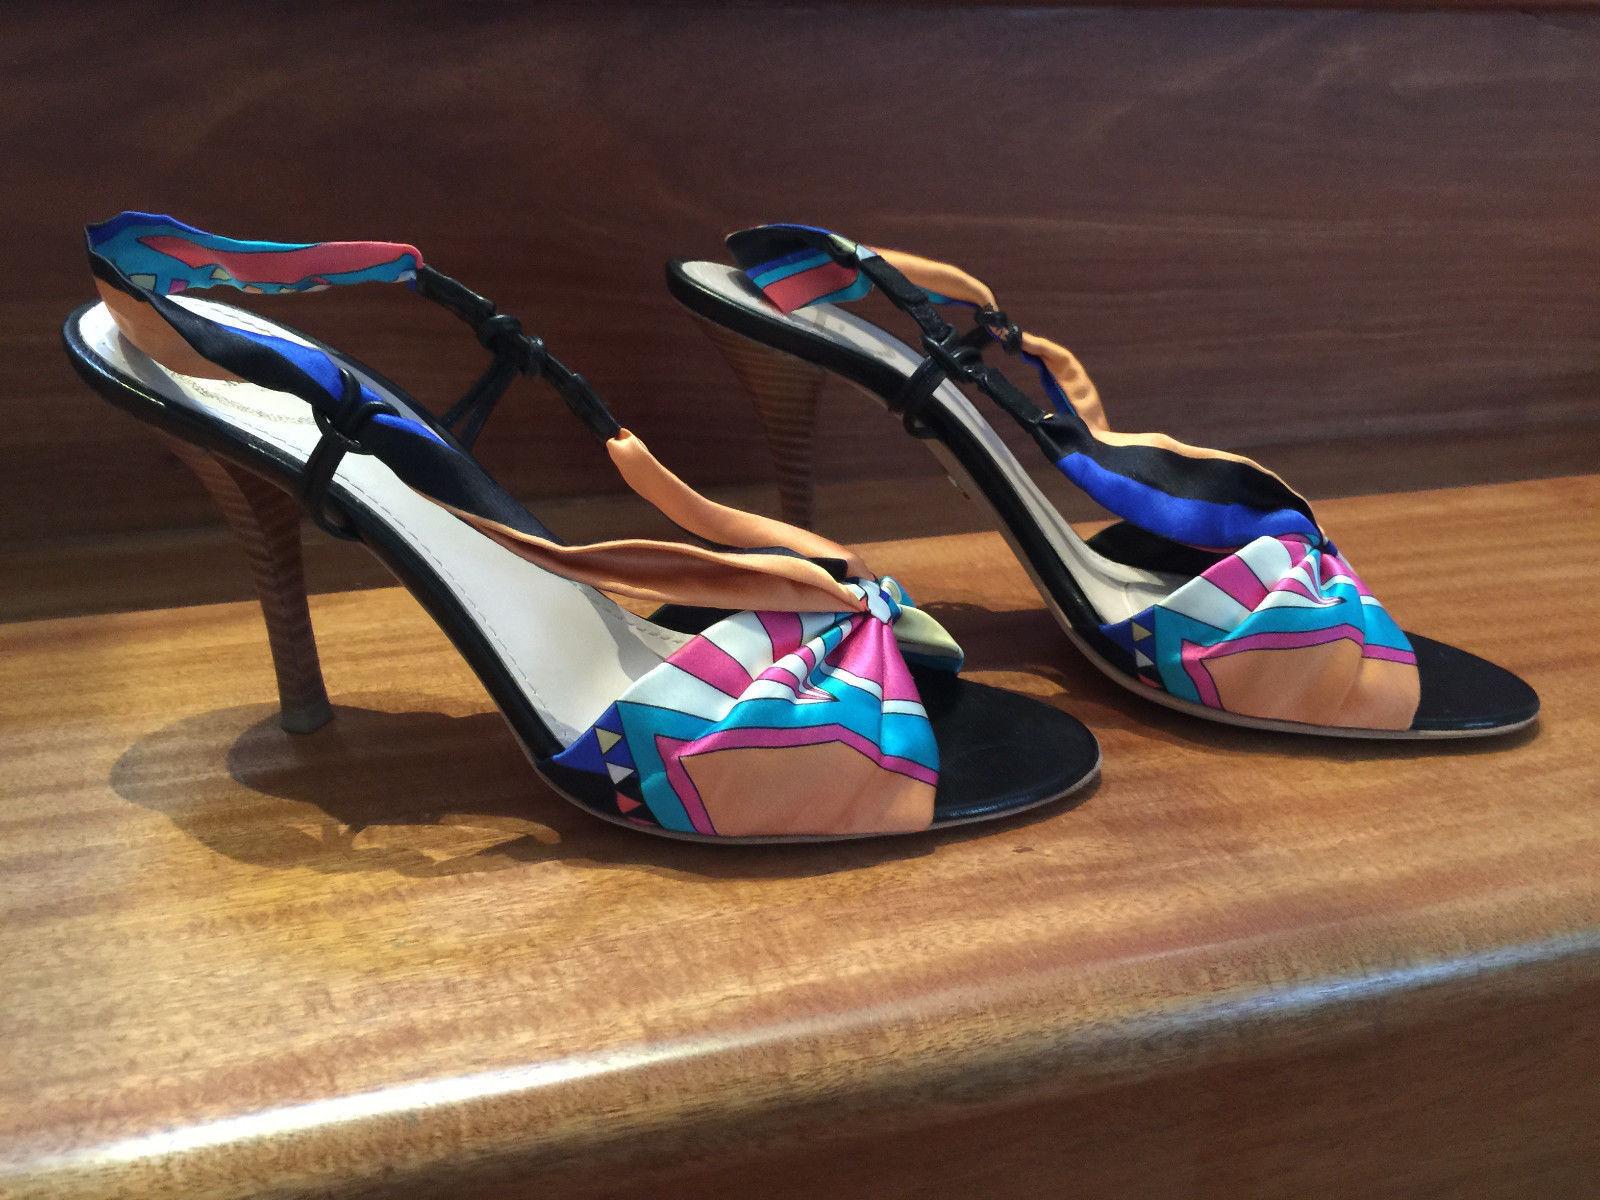 Emilio Pucci Designer Sandal Heels Silk Leather  38.5 with box  Excellent